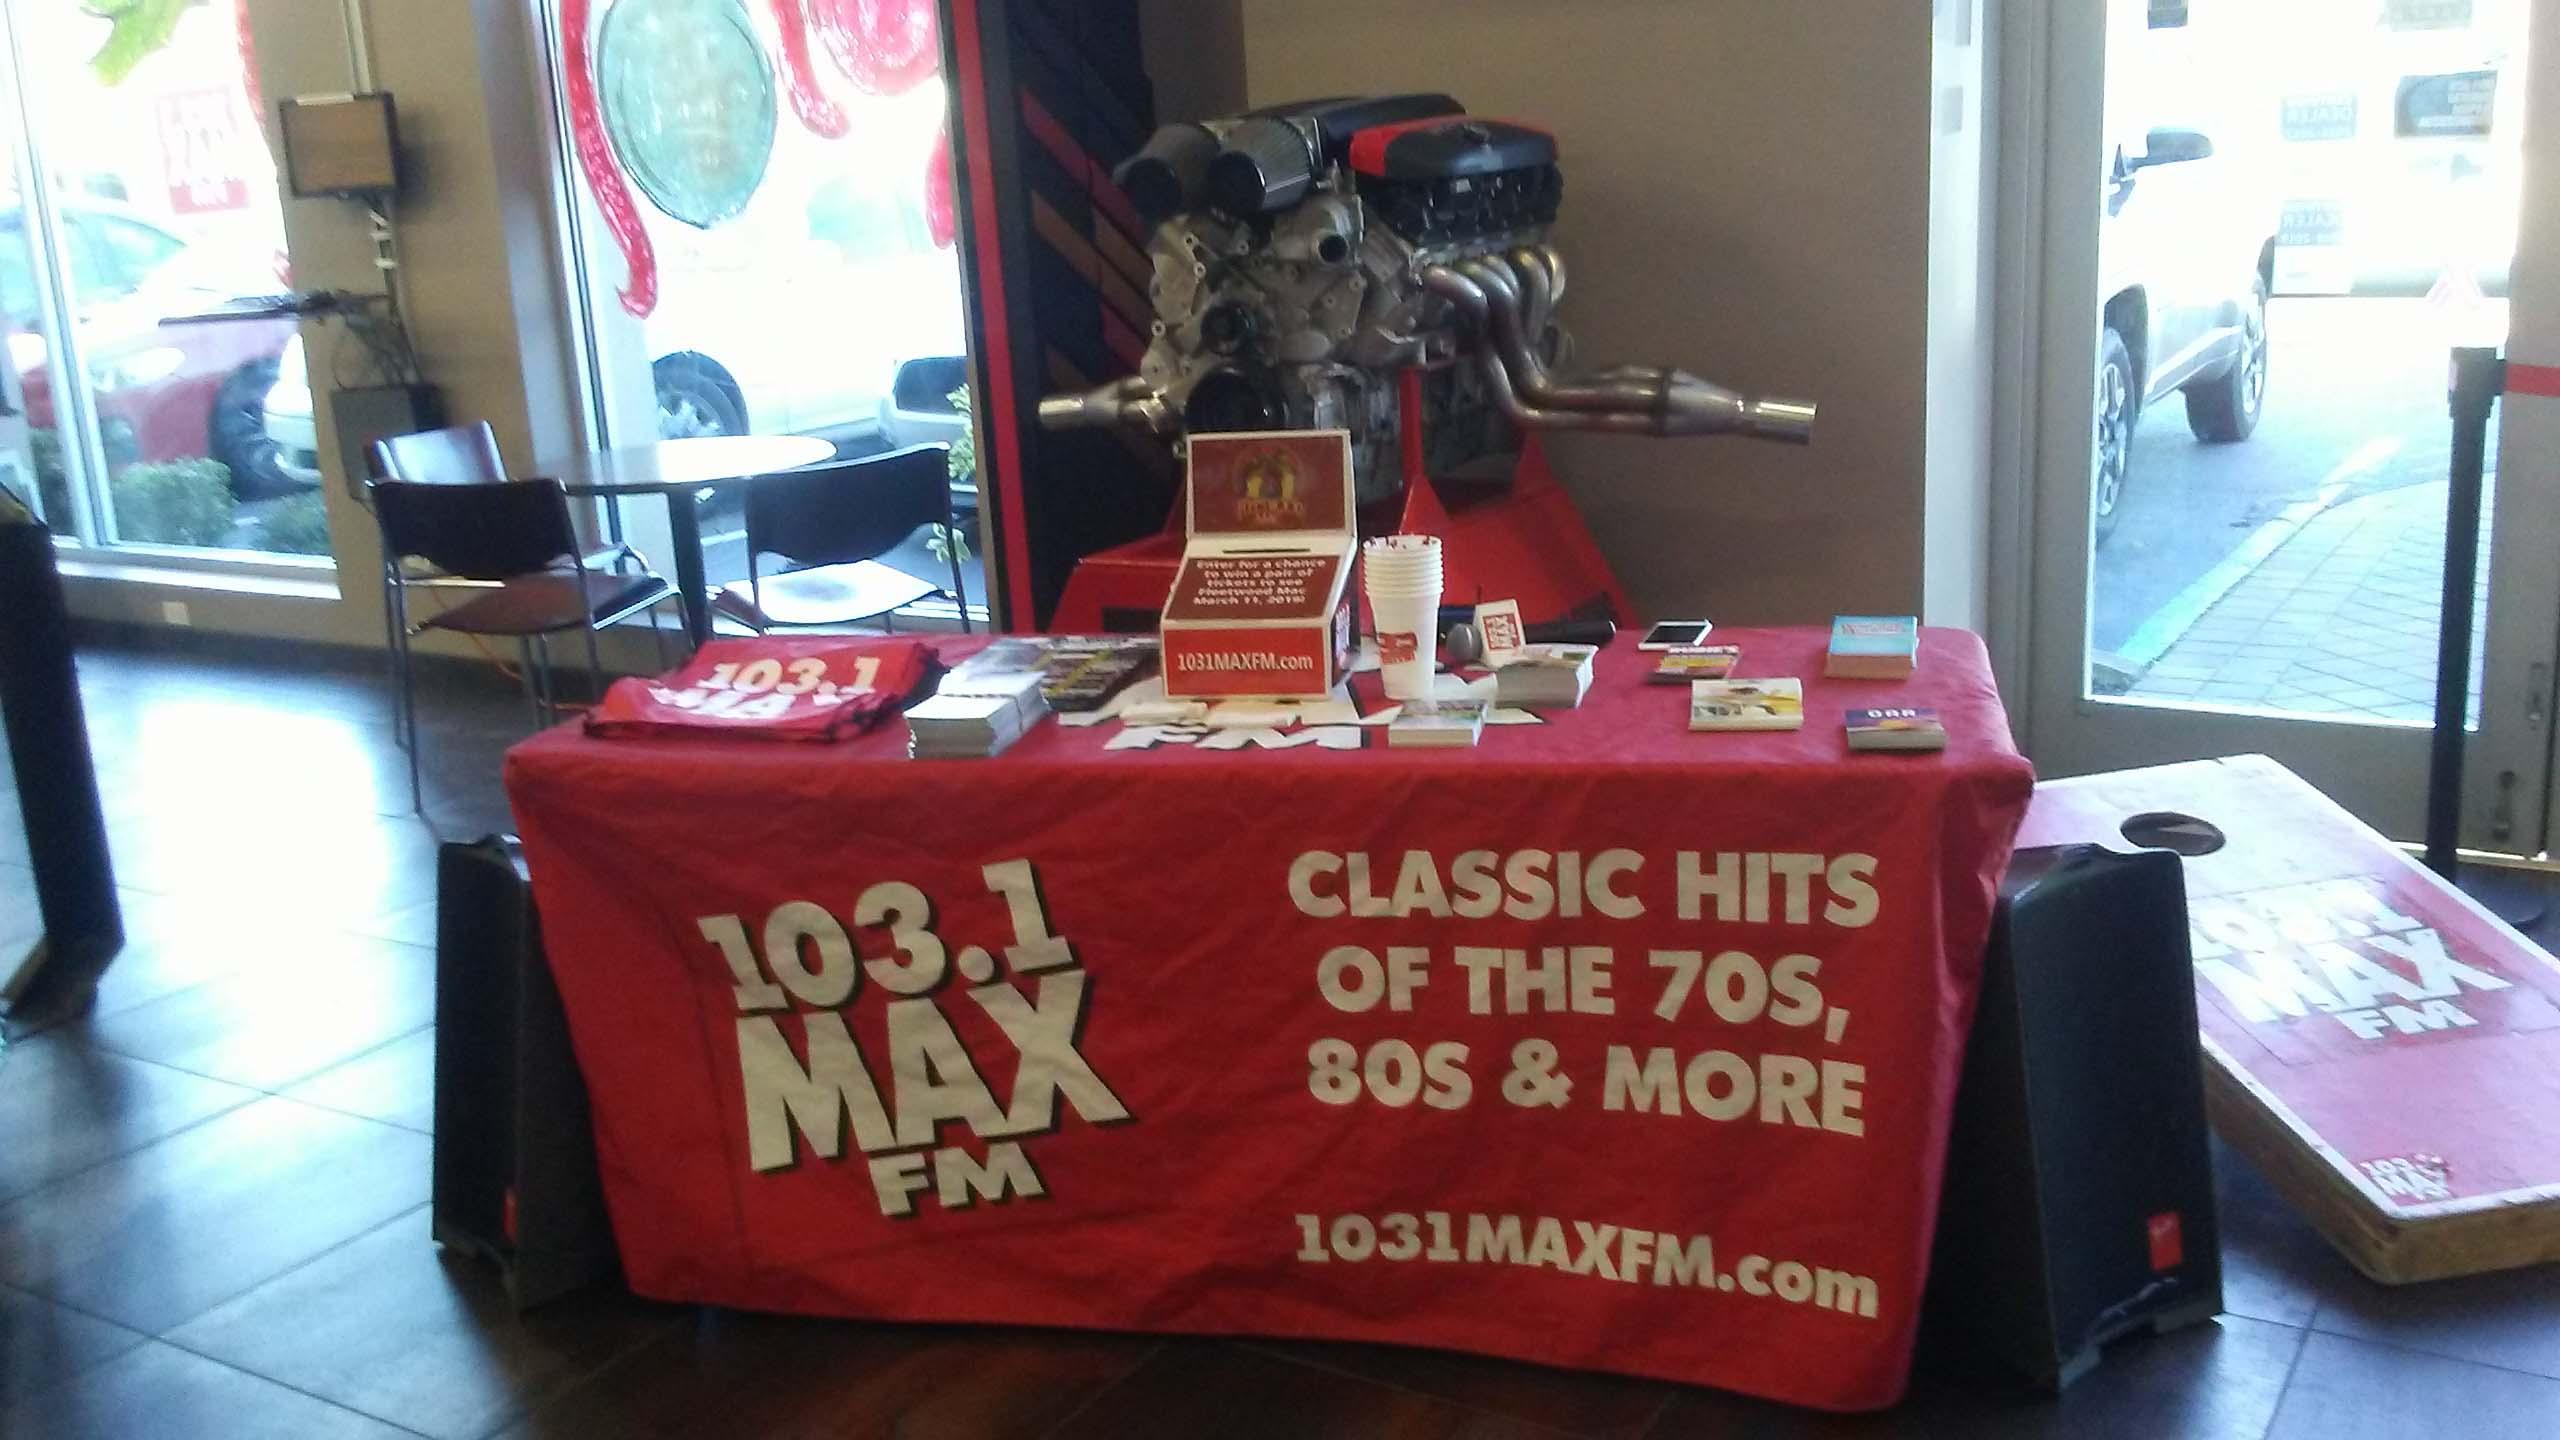 103.1 MAX FM at Security CDJR